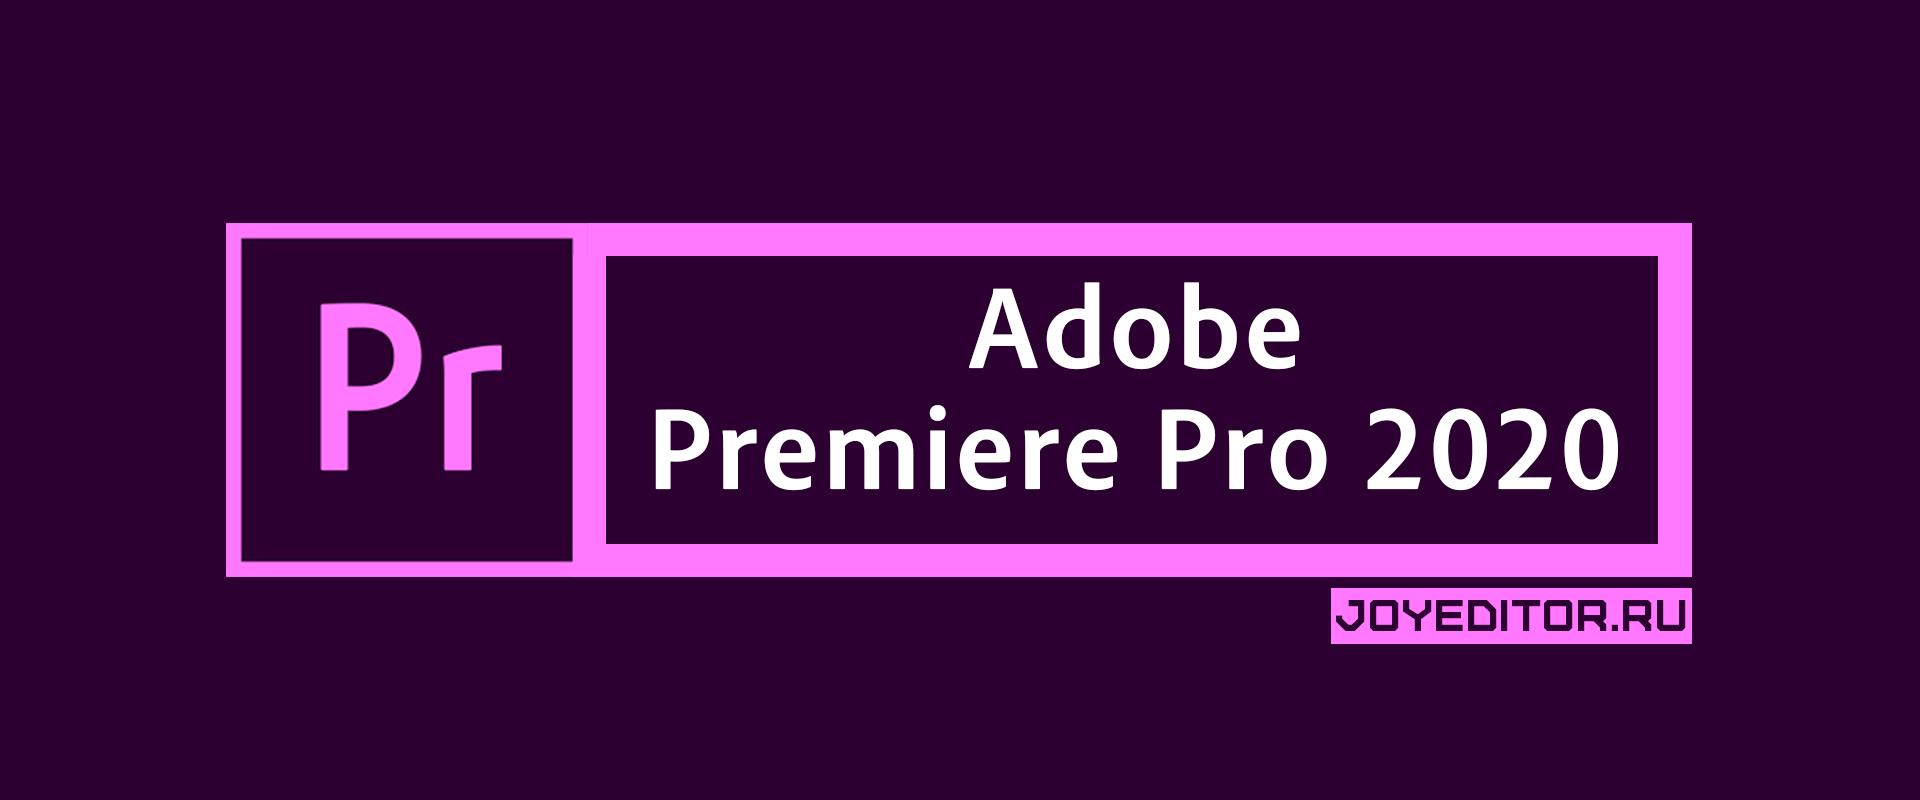 Adobe Premiere 2020